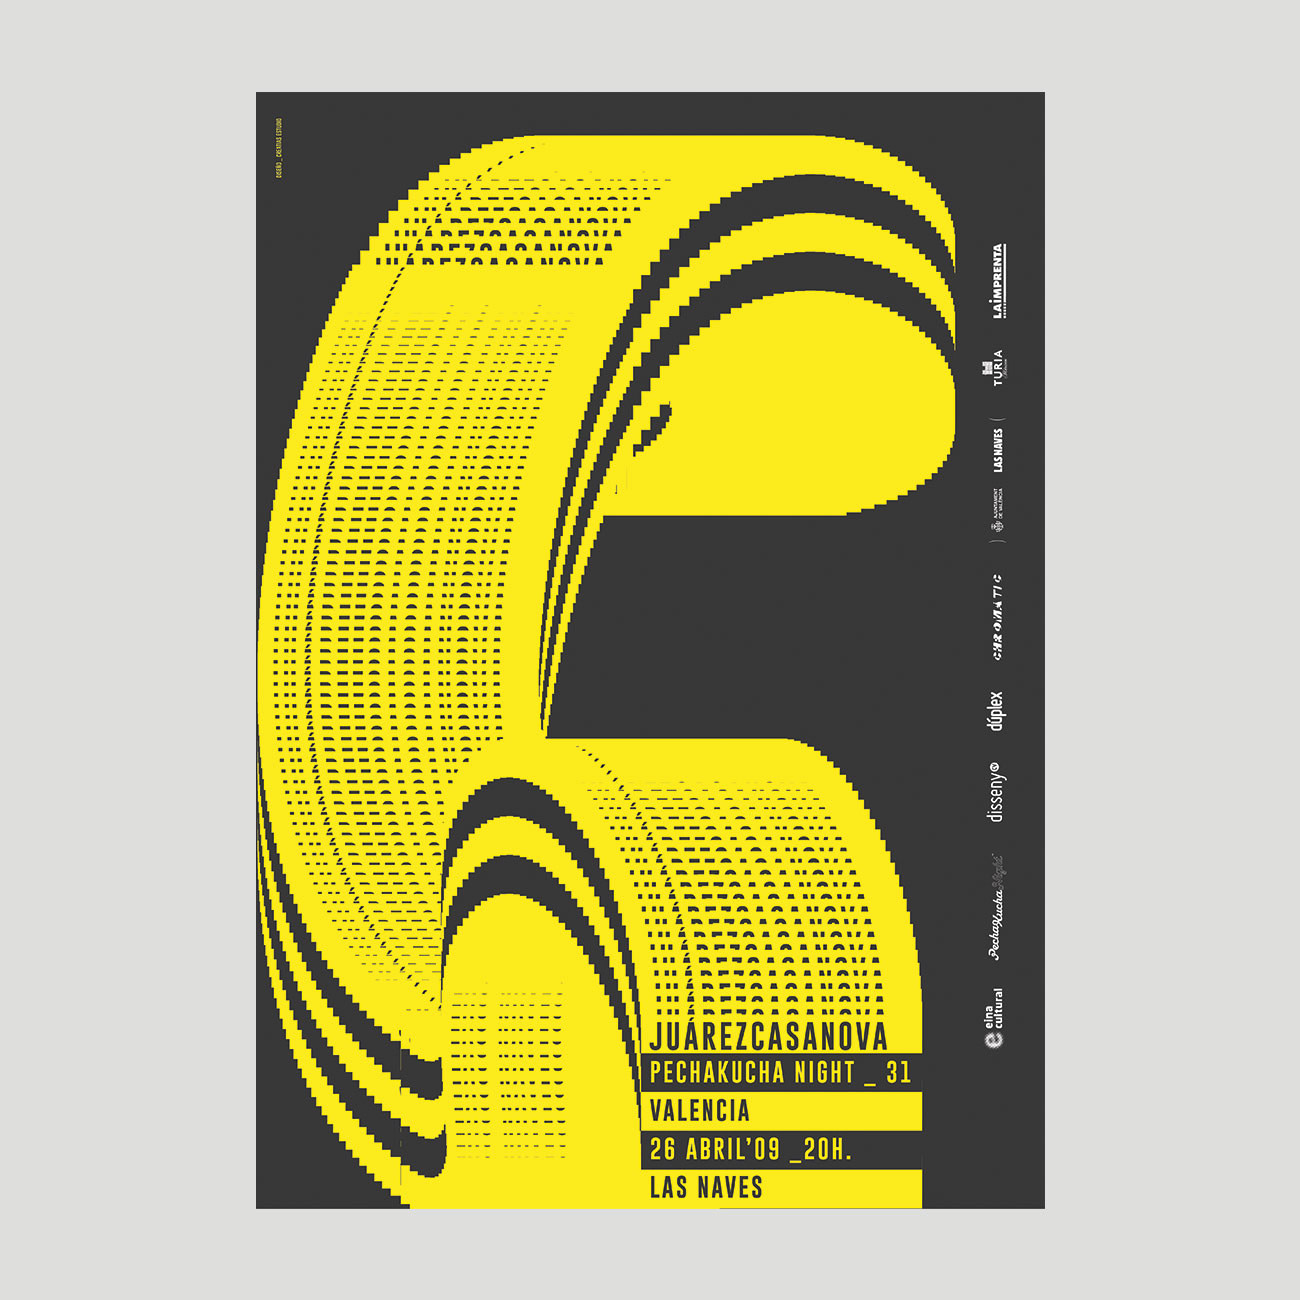 Cartel PechaKucha Night 31 Valencia, por Creatias Estudio